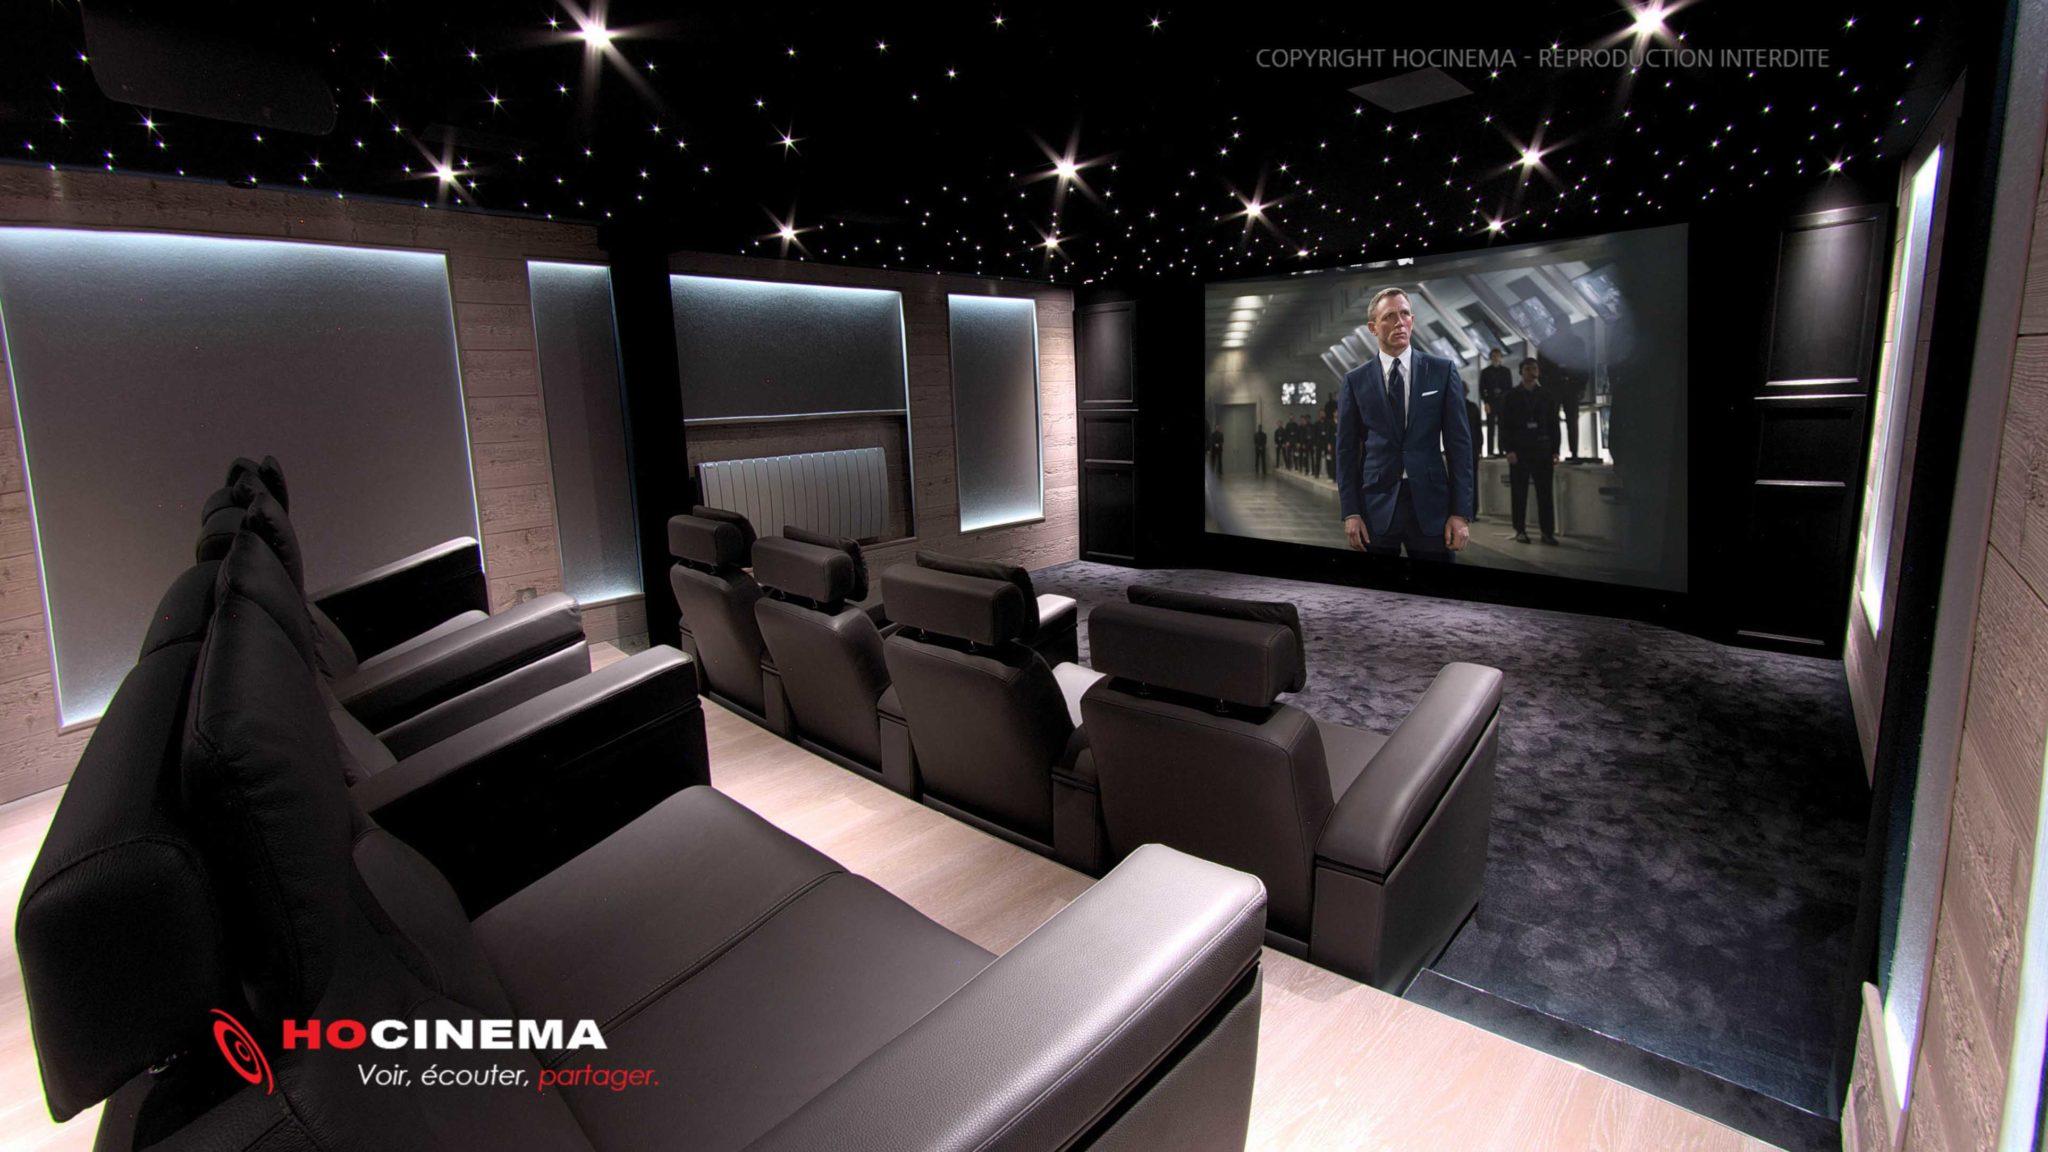 salle cinema maison salle de cinma maison with salle cinema maison ralisation duune salle de. Black Bedroom Furniture Sets. Home Design Ideas